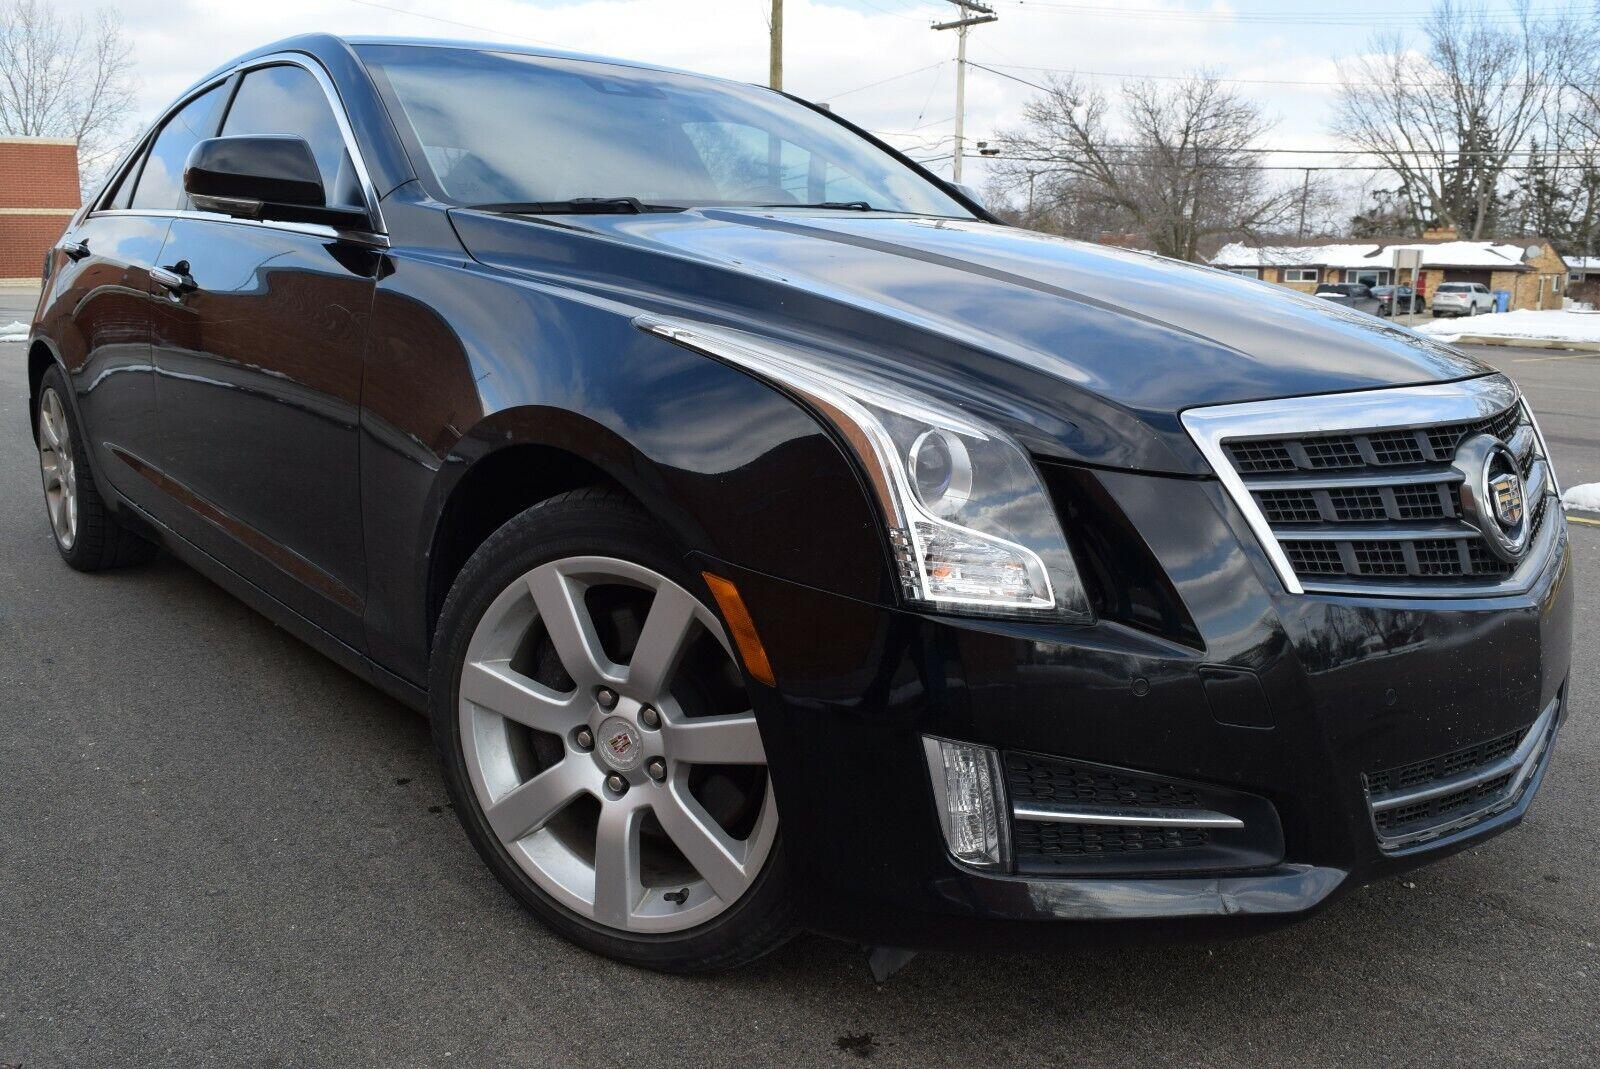 2014 Cadillac ATS 2.0T Performance 2.0L/I-4/Turbo/AWD/Sunroof/Navigation/Camera